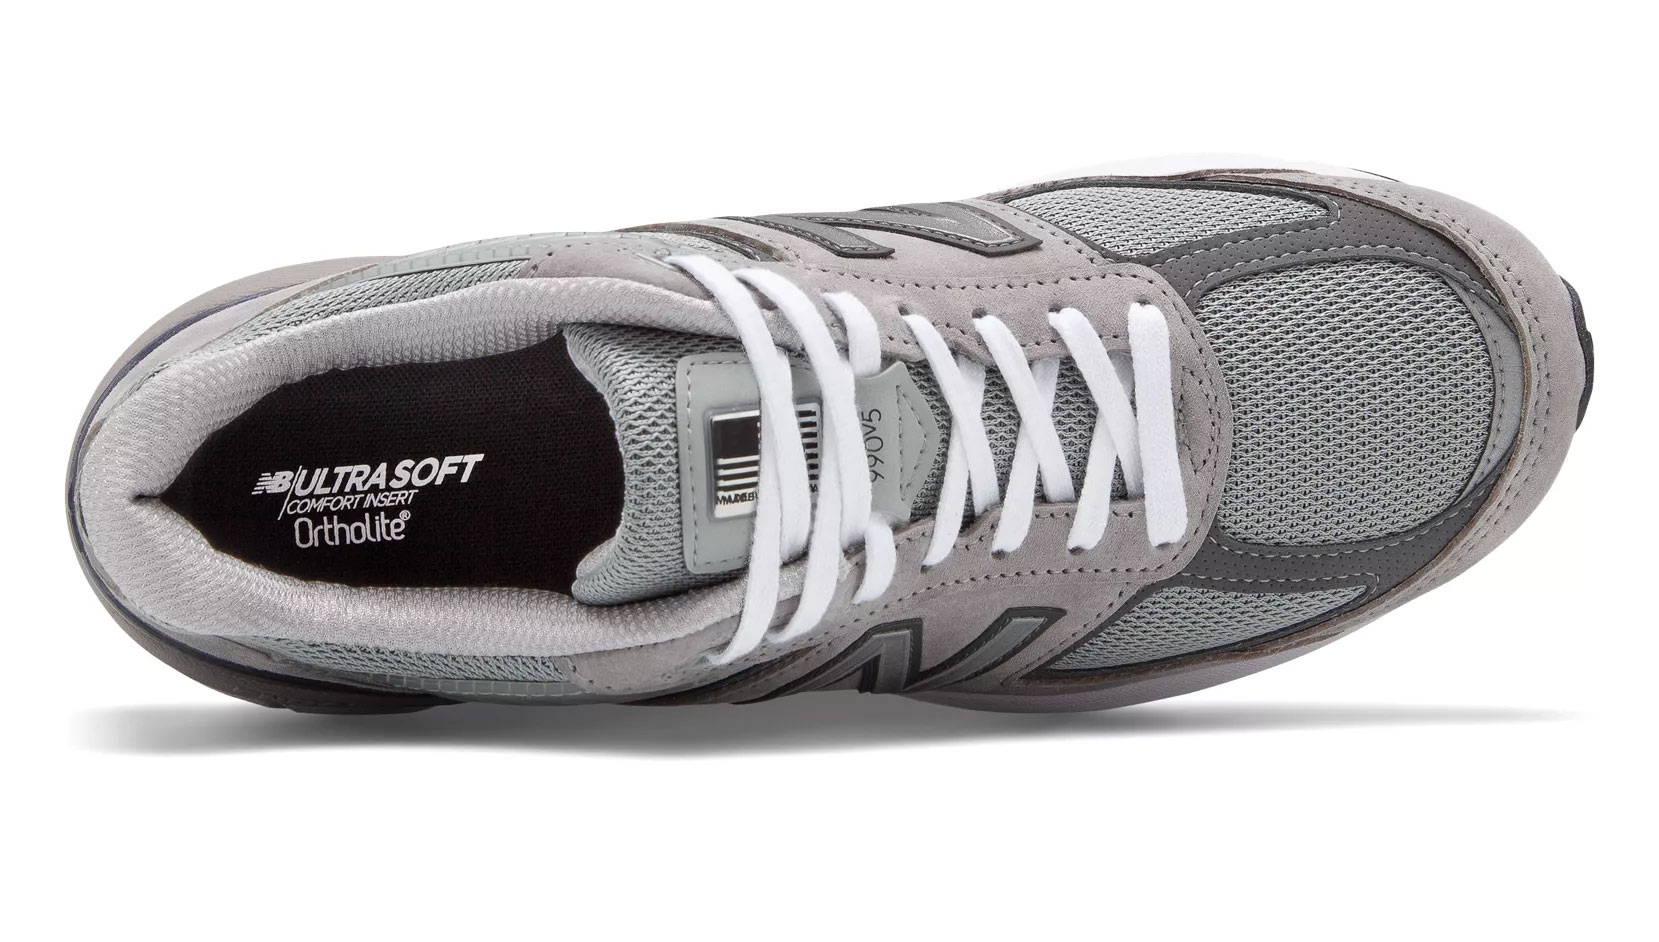 best sneakers 573b0 e66fb New Balance 990v5 vs 990v4 - Differences Explained ...